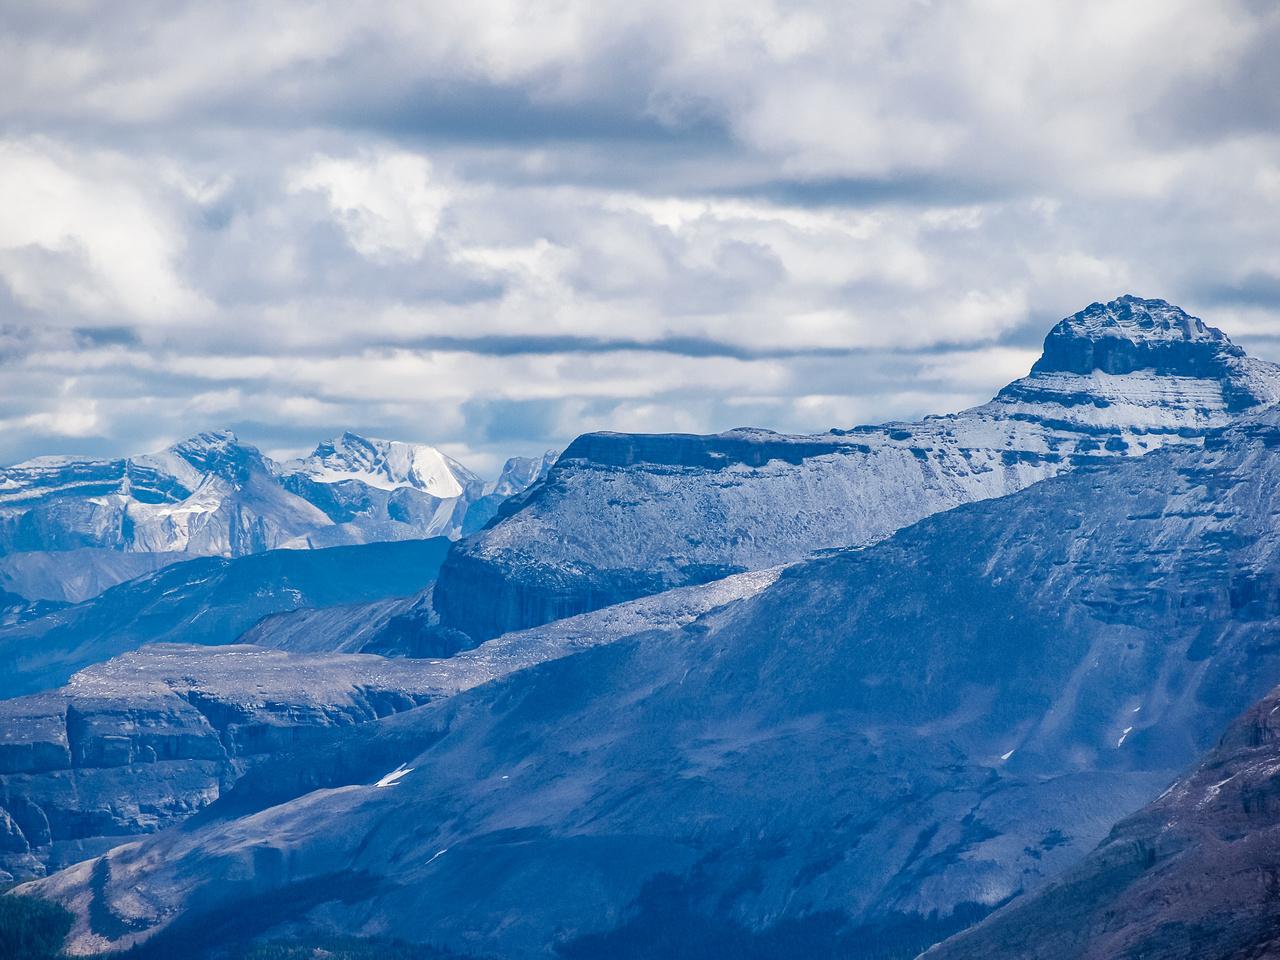 Looking over Divide Peak towards Niblock.